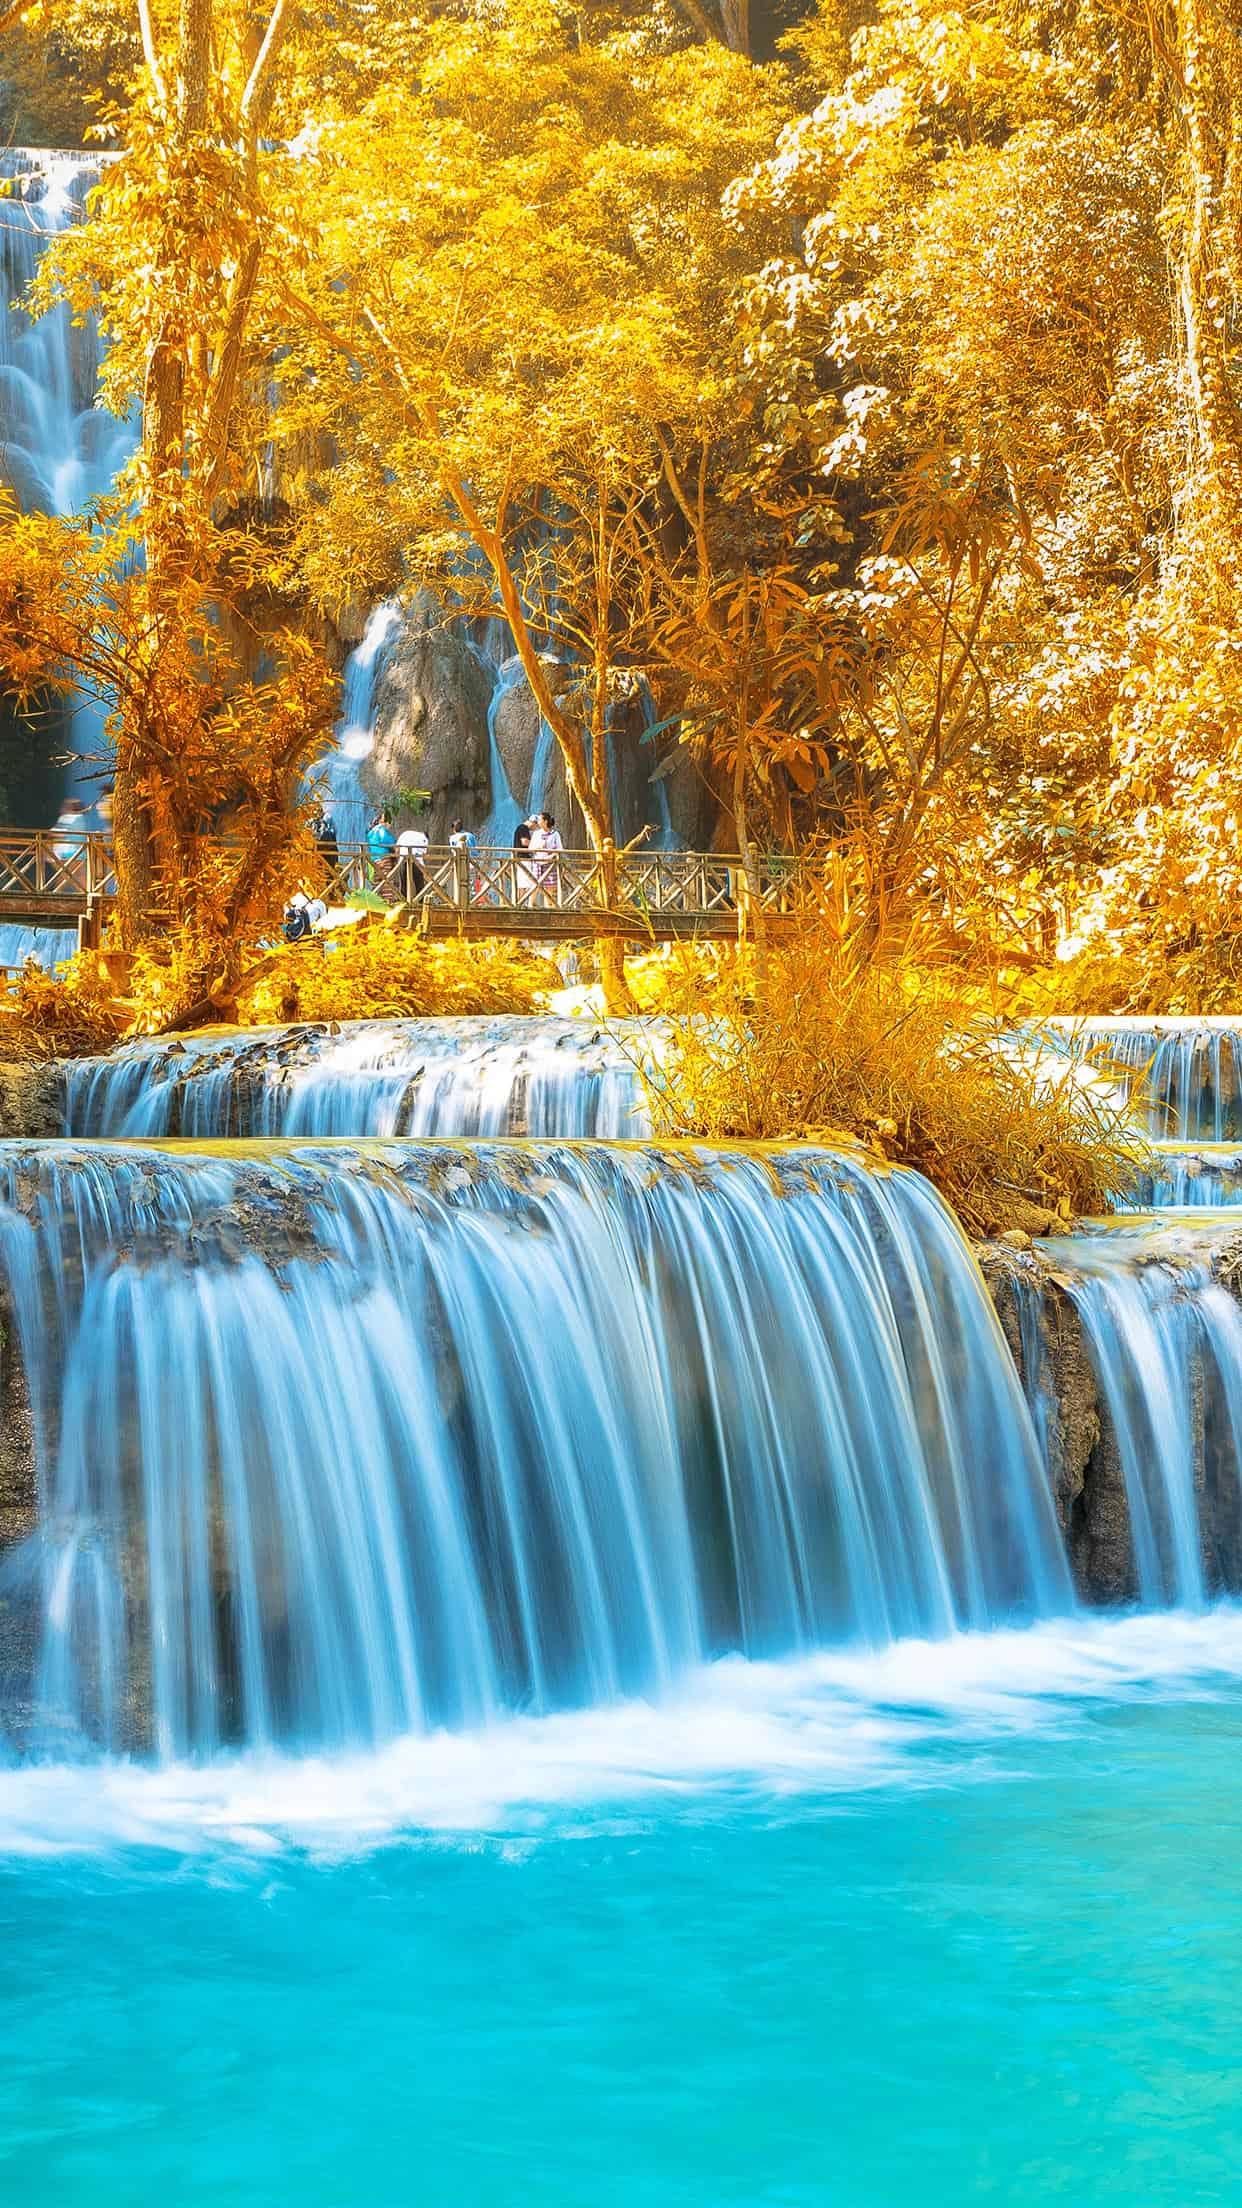 Best Iphone Wallpaper Website 15 Fall Iphone Xs Wallpapers Best Autumn Backgrounds